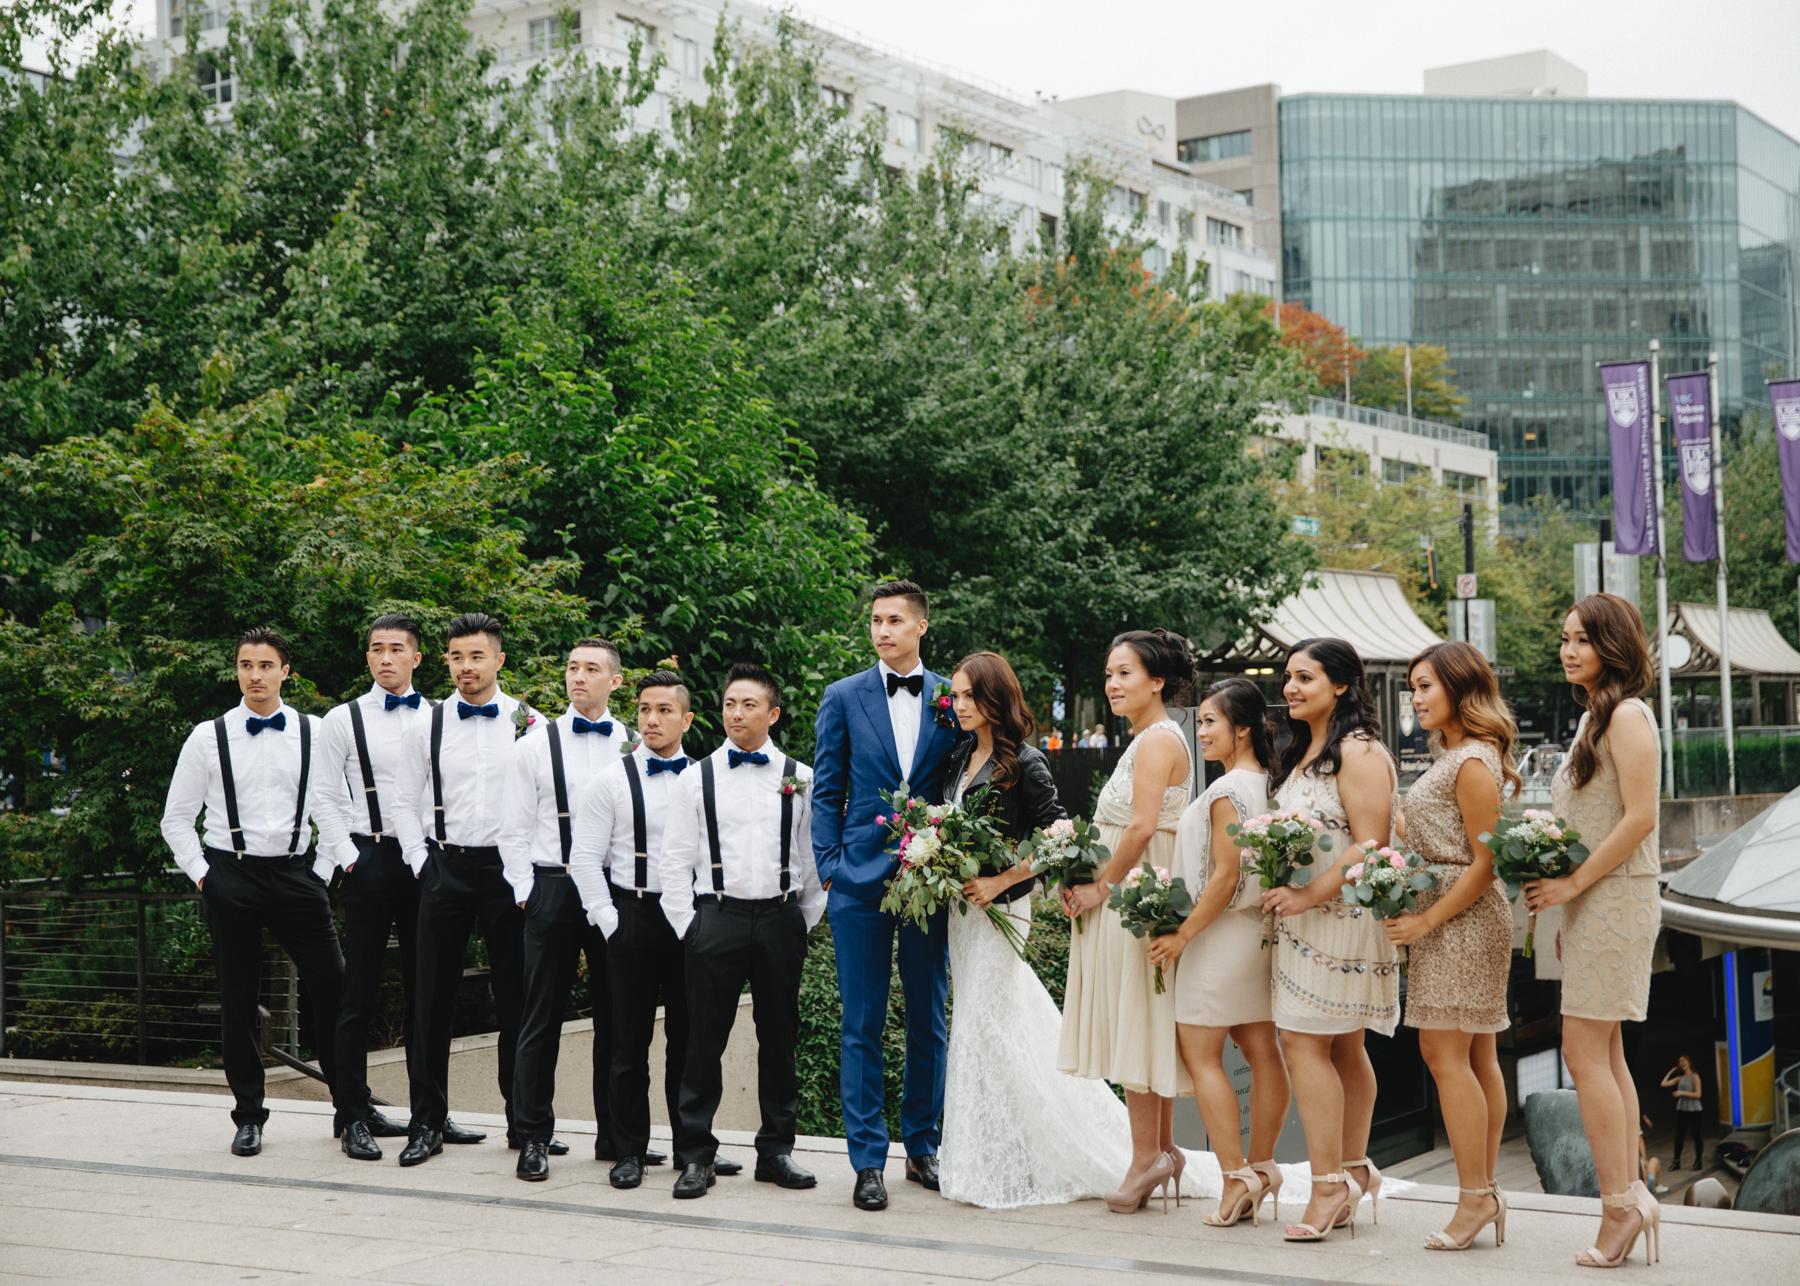 kaoverii_silva_photographer_via-herafilms_kieu_kaz_wedding-16.jpg